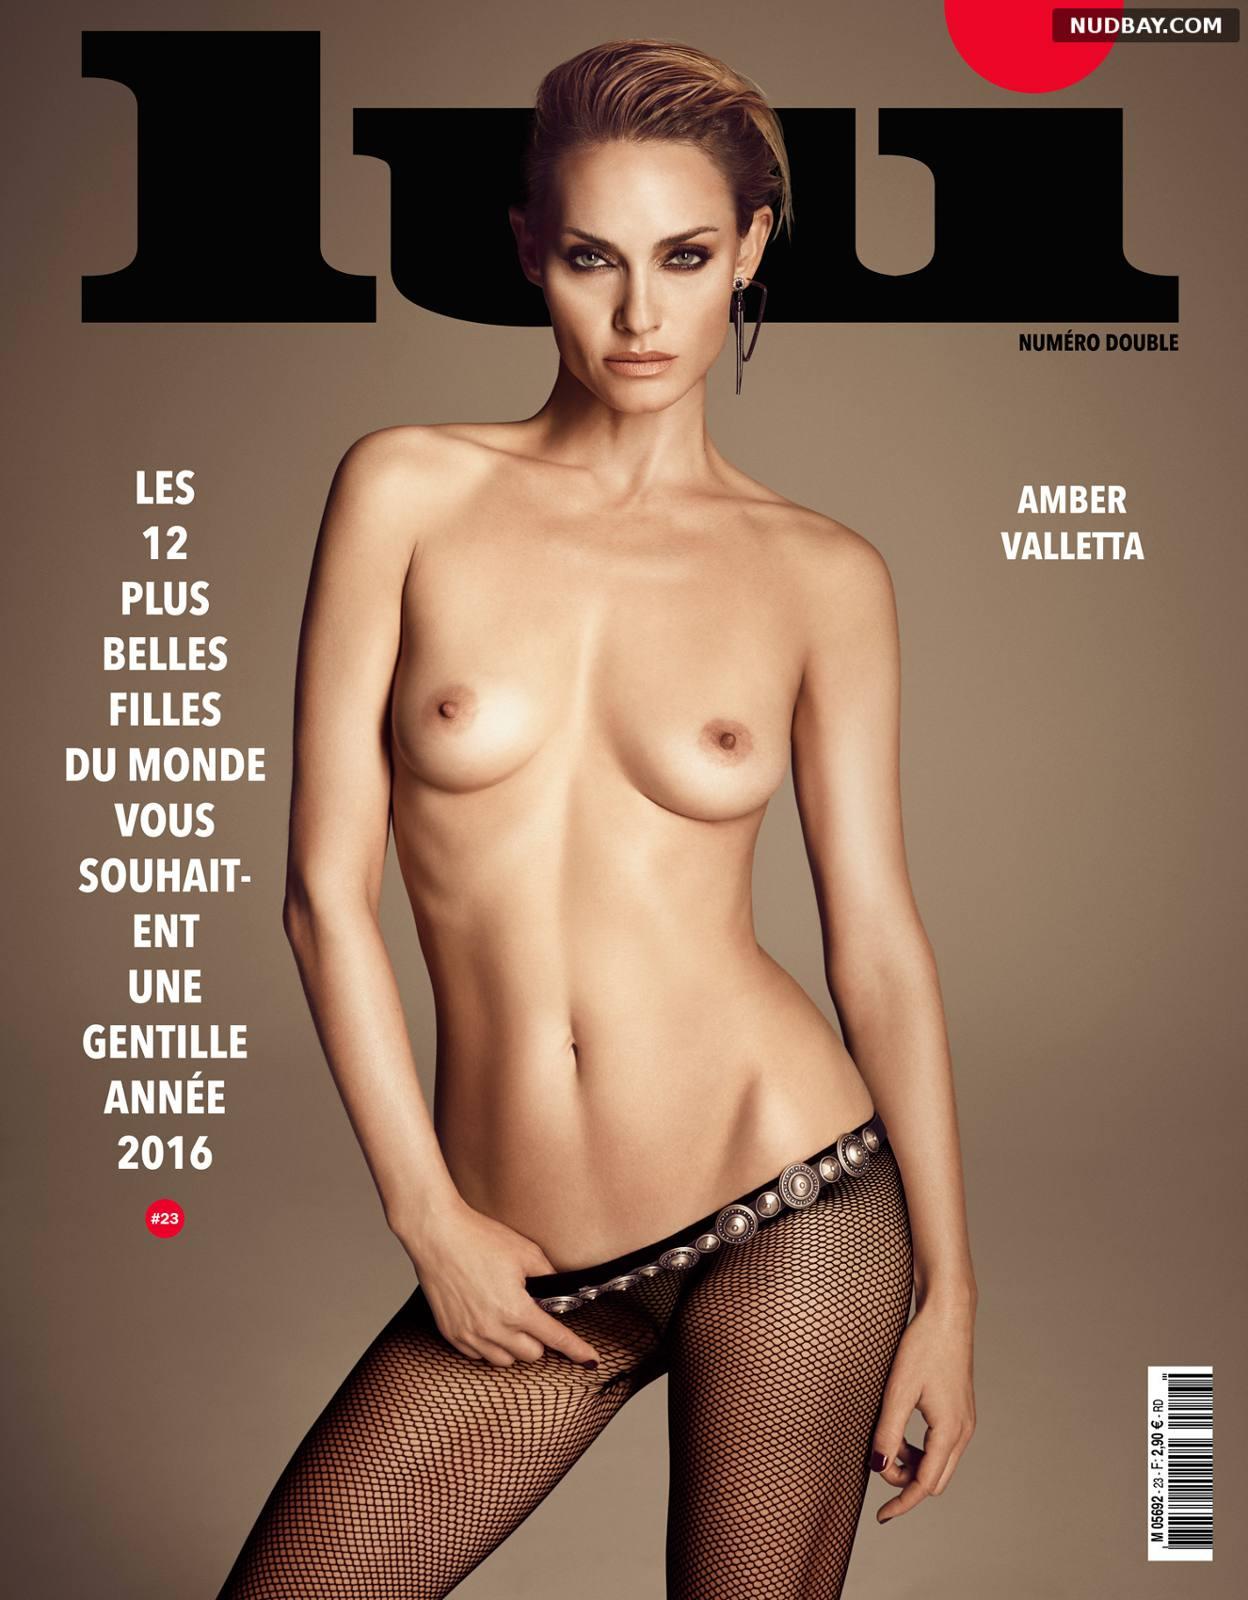 Amber Valletta Nude for Lui Magazine December 2015